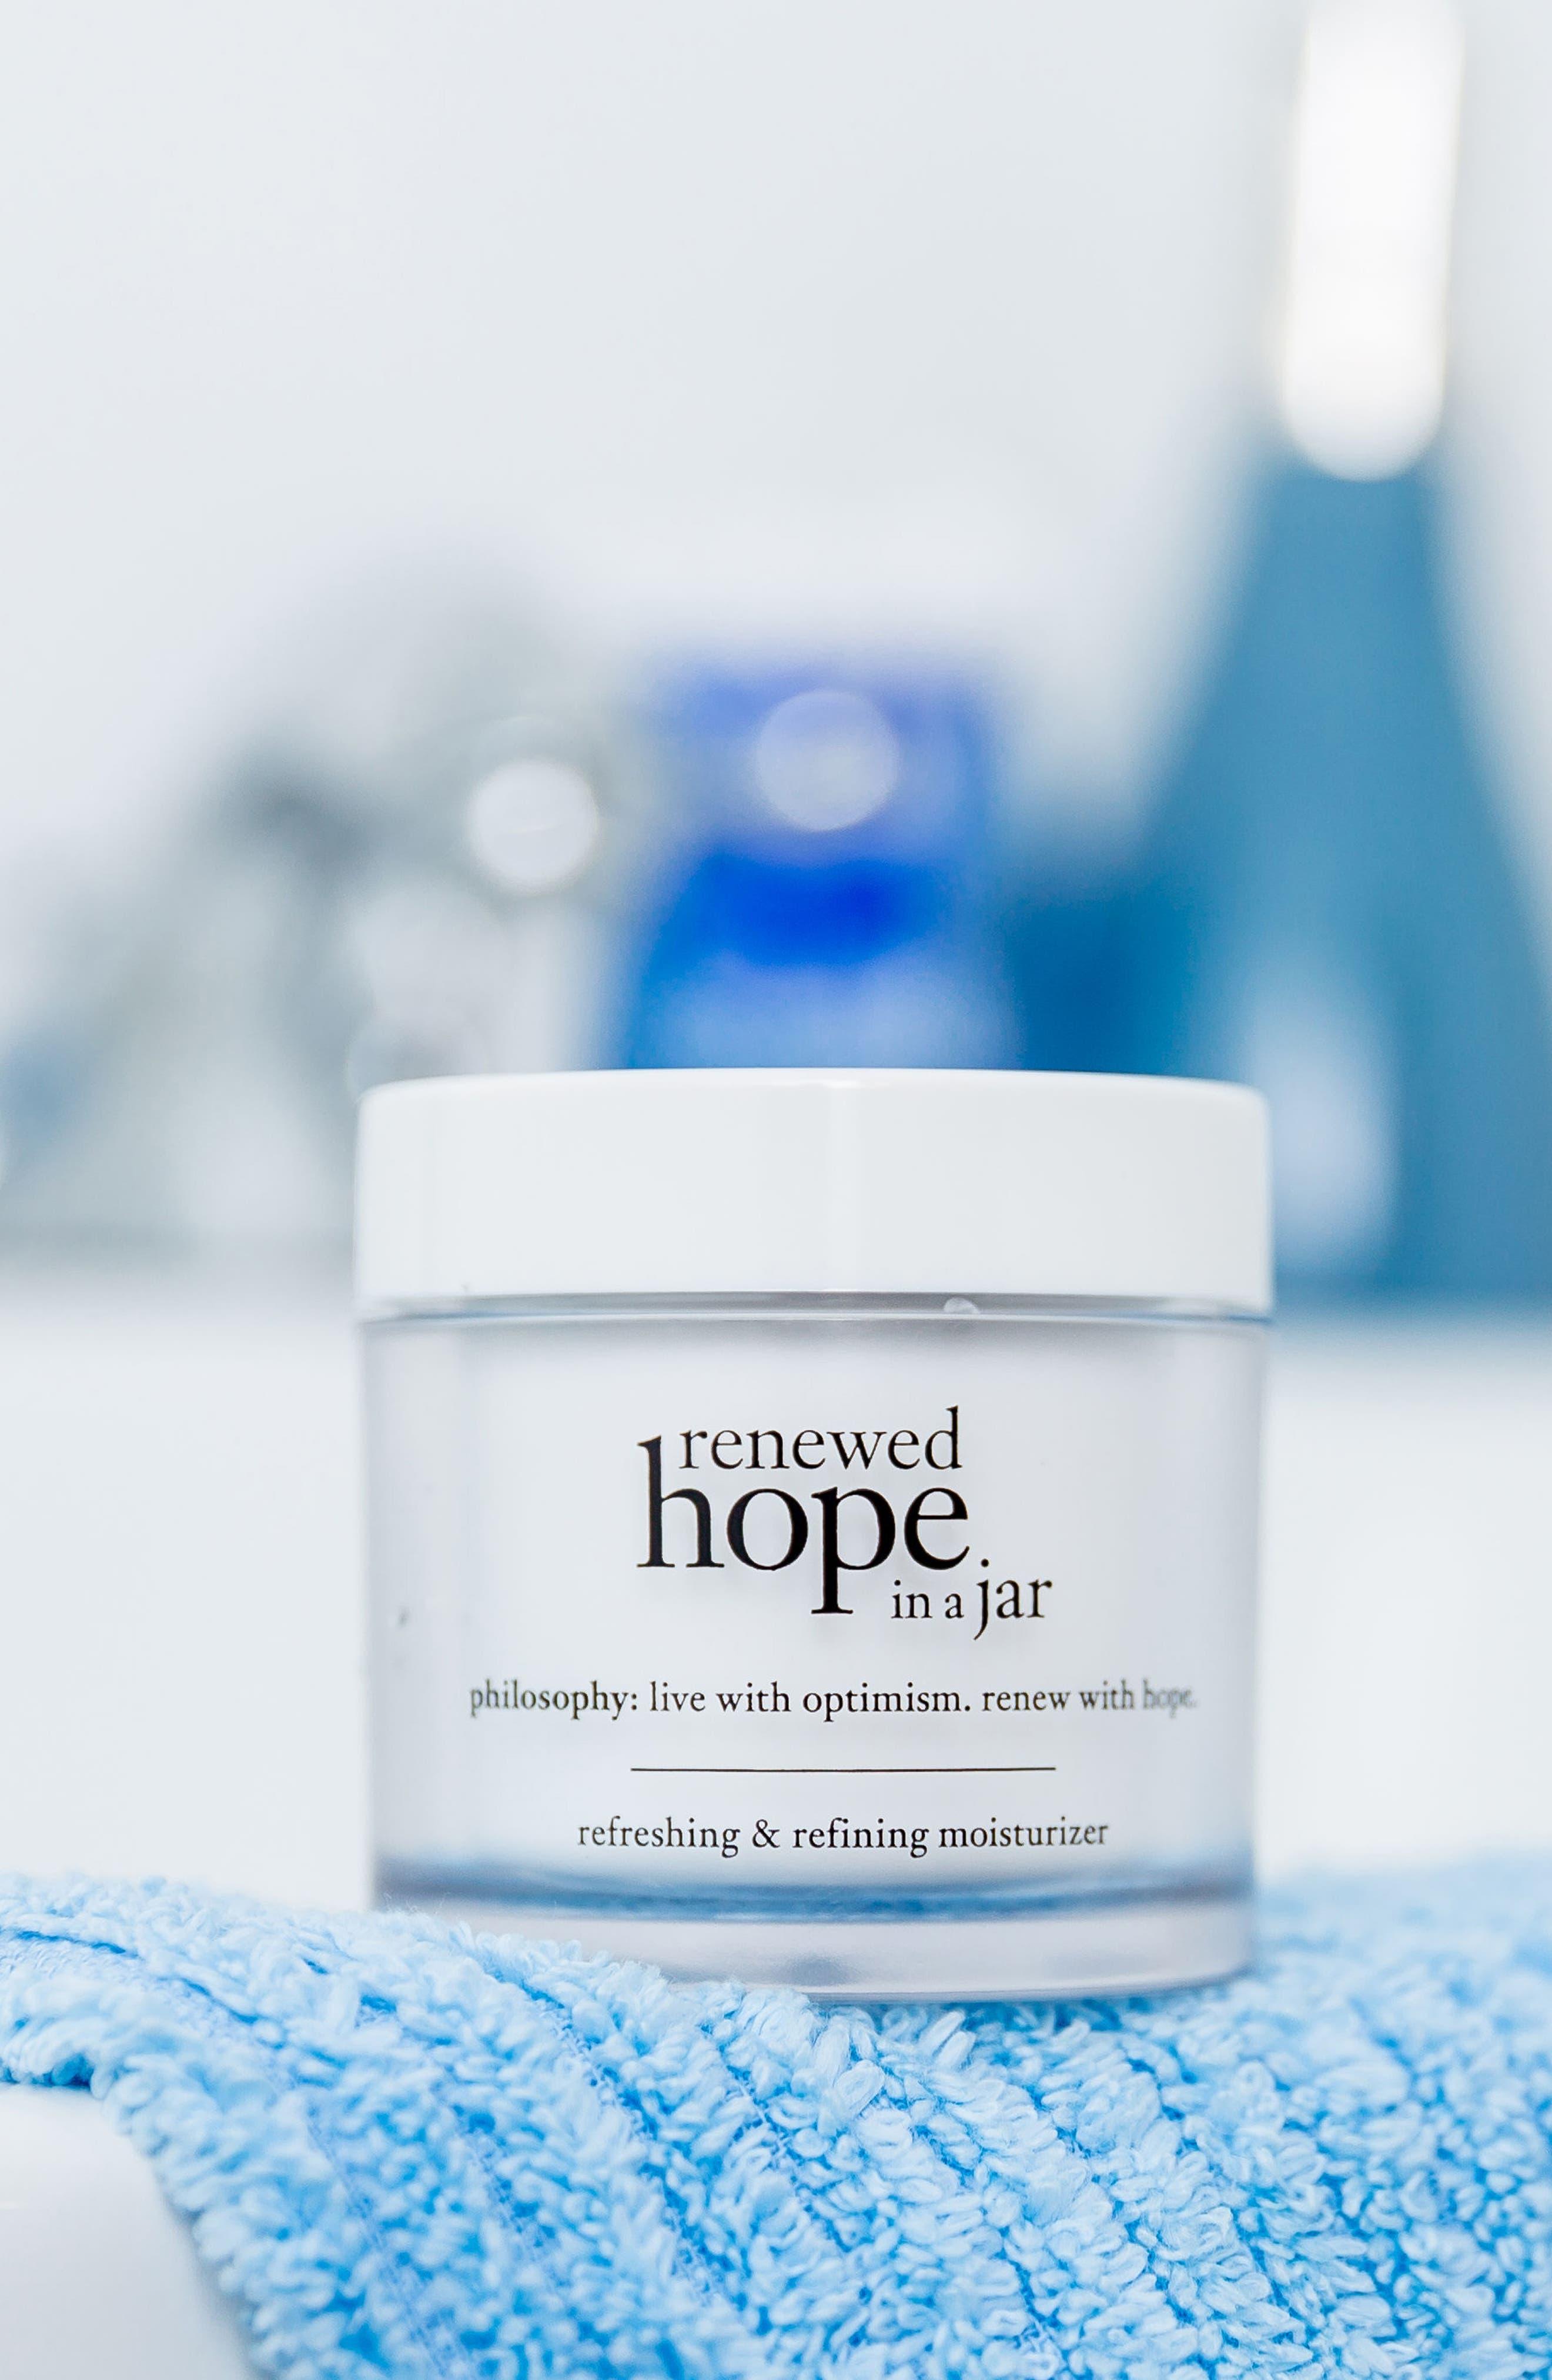 Alternate Image 3  - philosophy renewed hope in a jar for all skin types